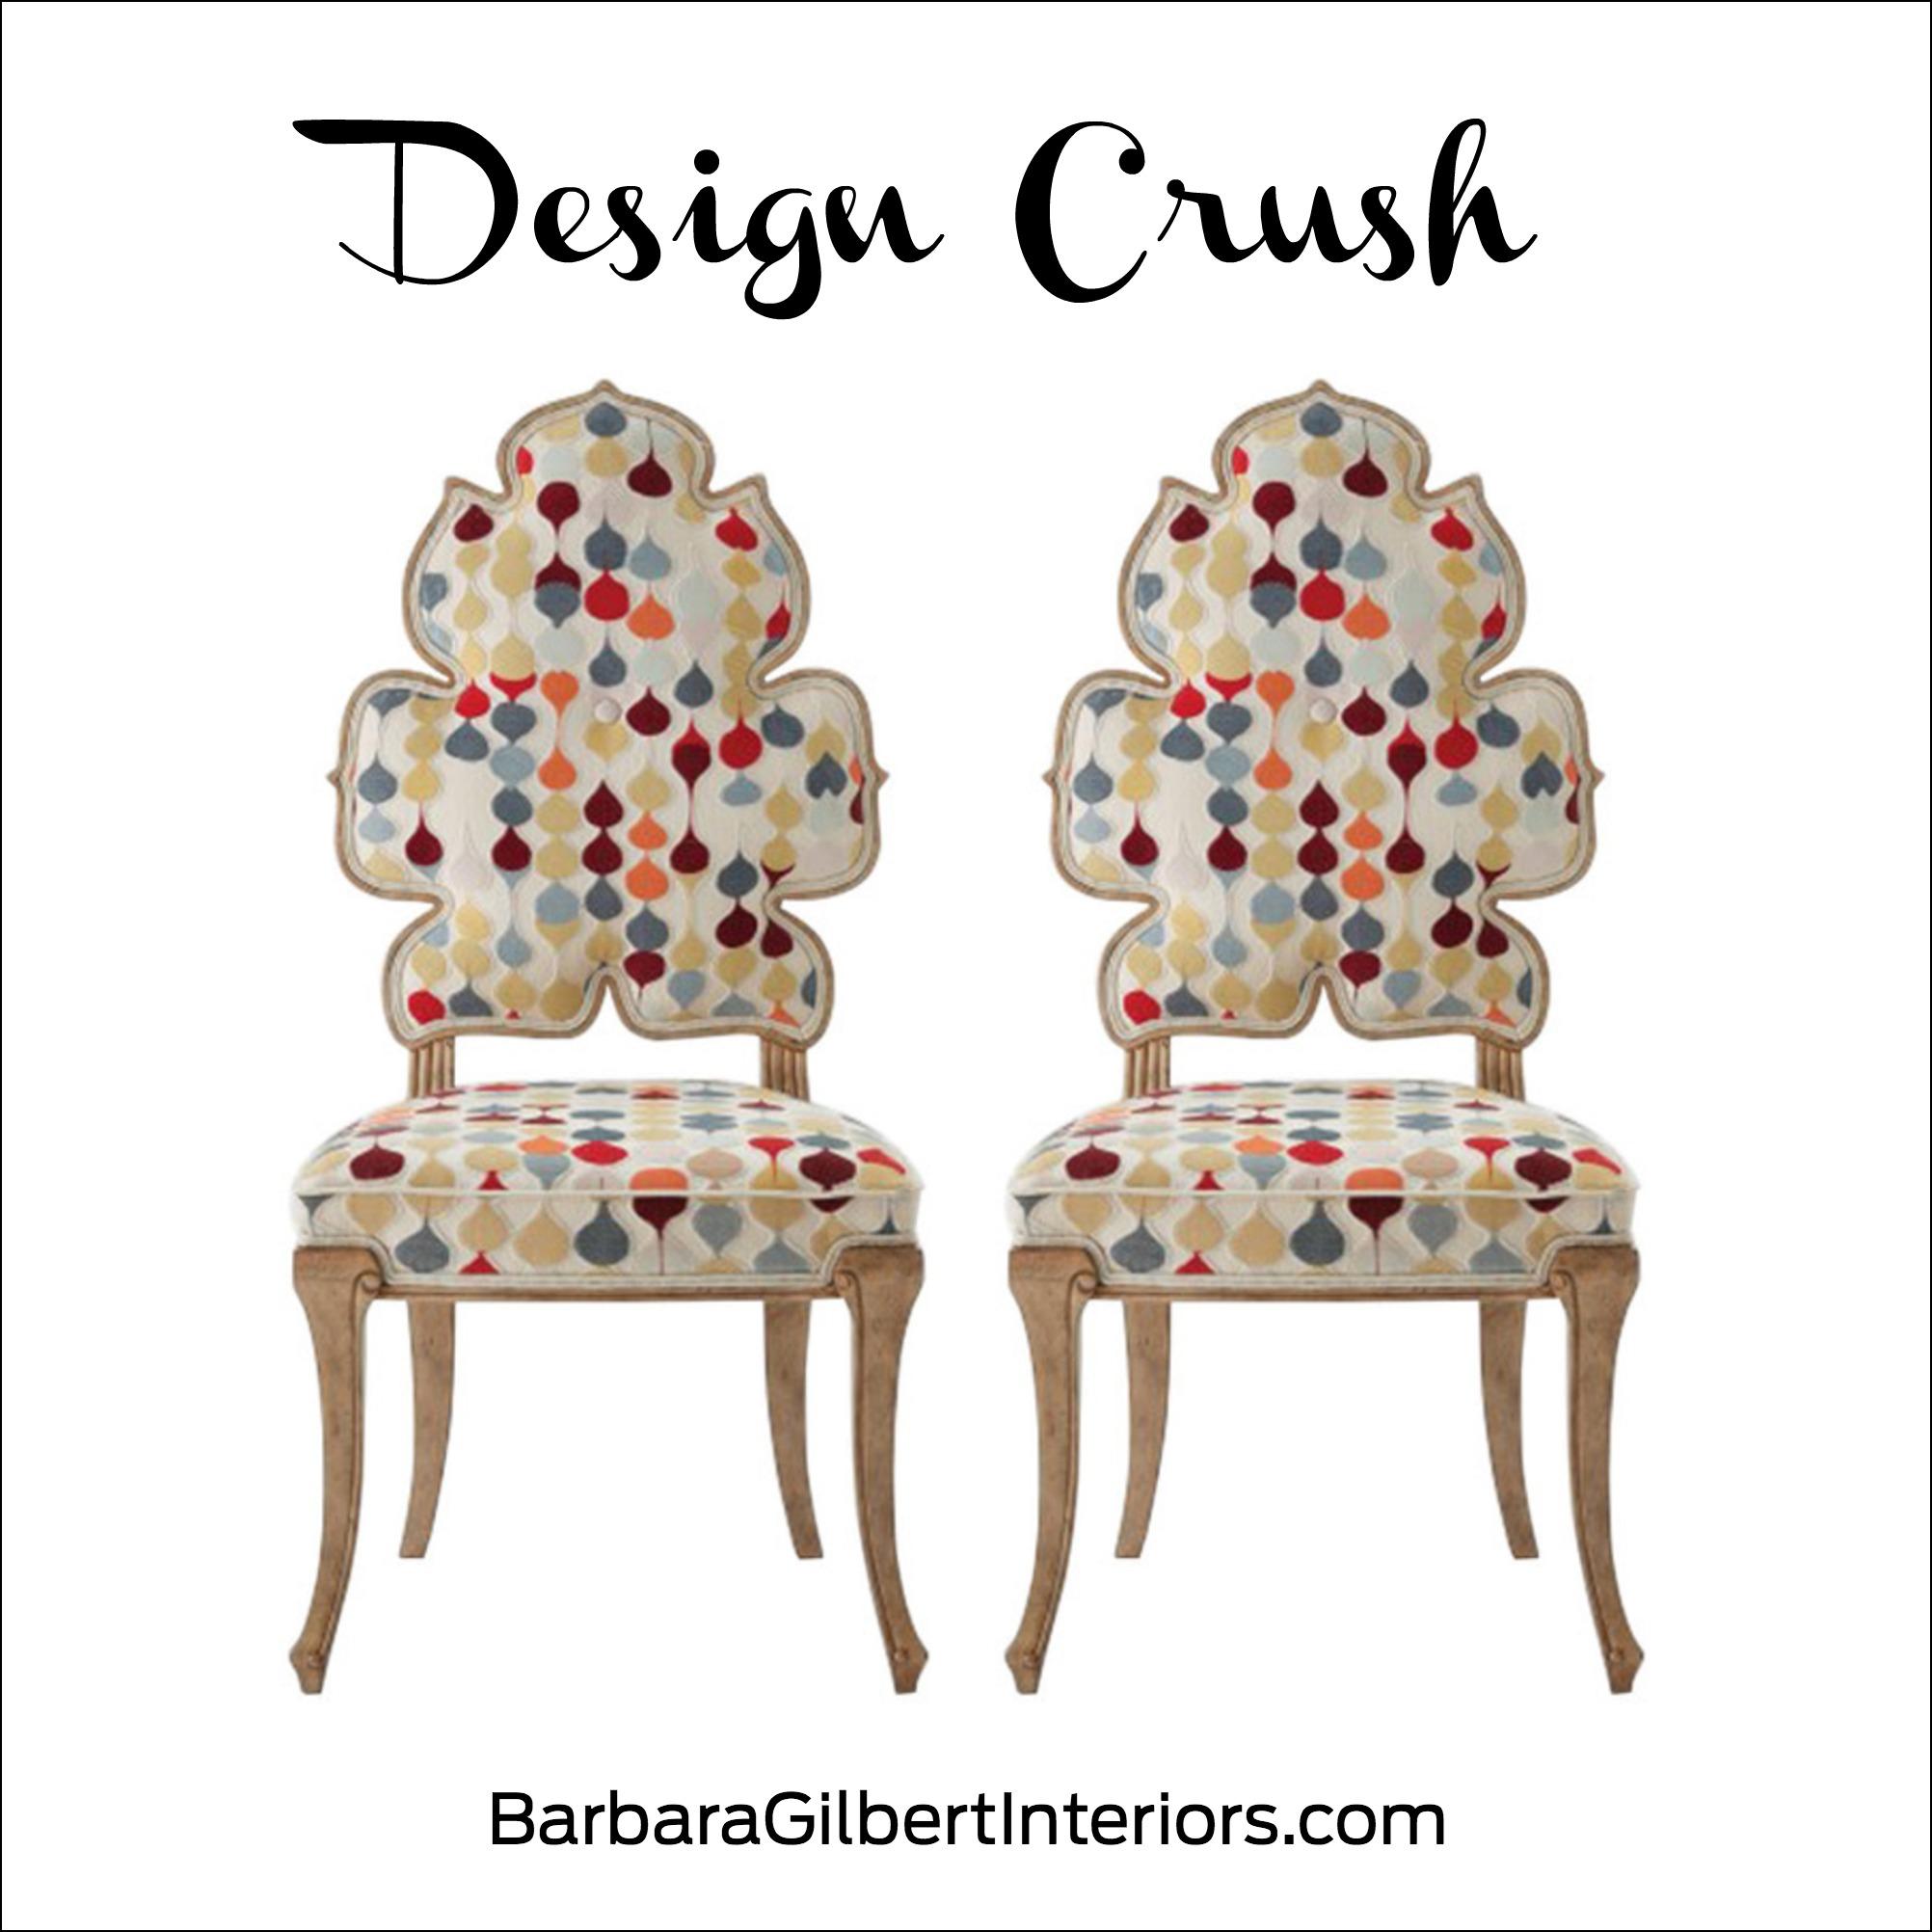 Design Crush: Wiggle Dining Chair | Interior Design Dallas | Barbara Gilbert Interiors